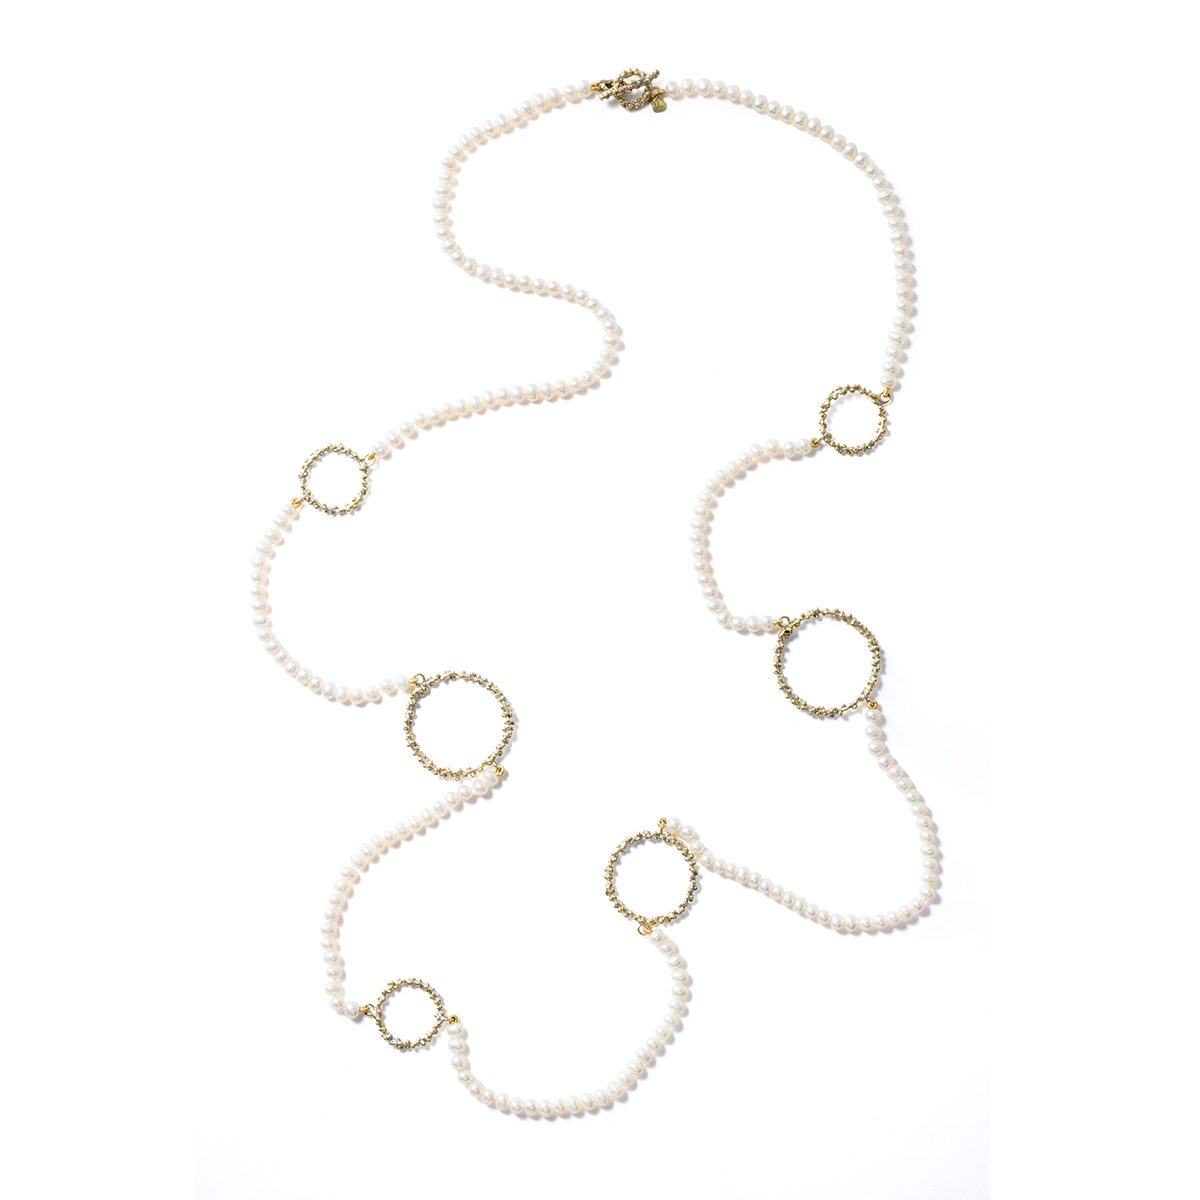 DANIELA DE MARCHI|Necklaces